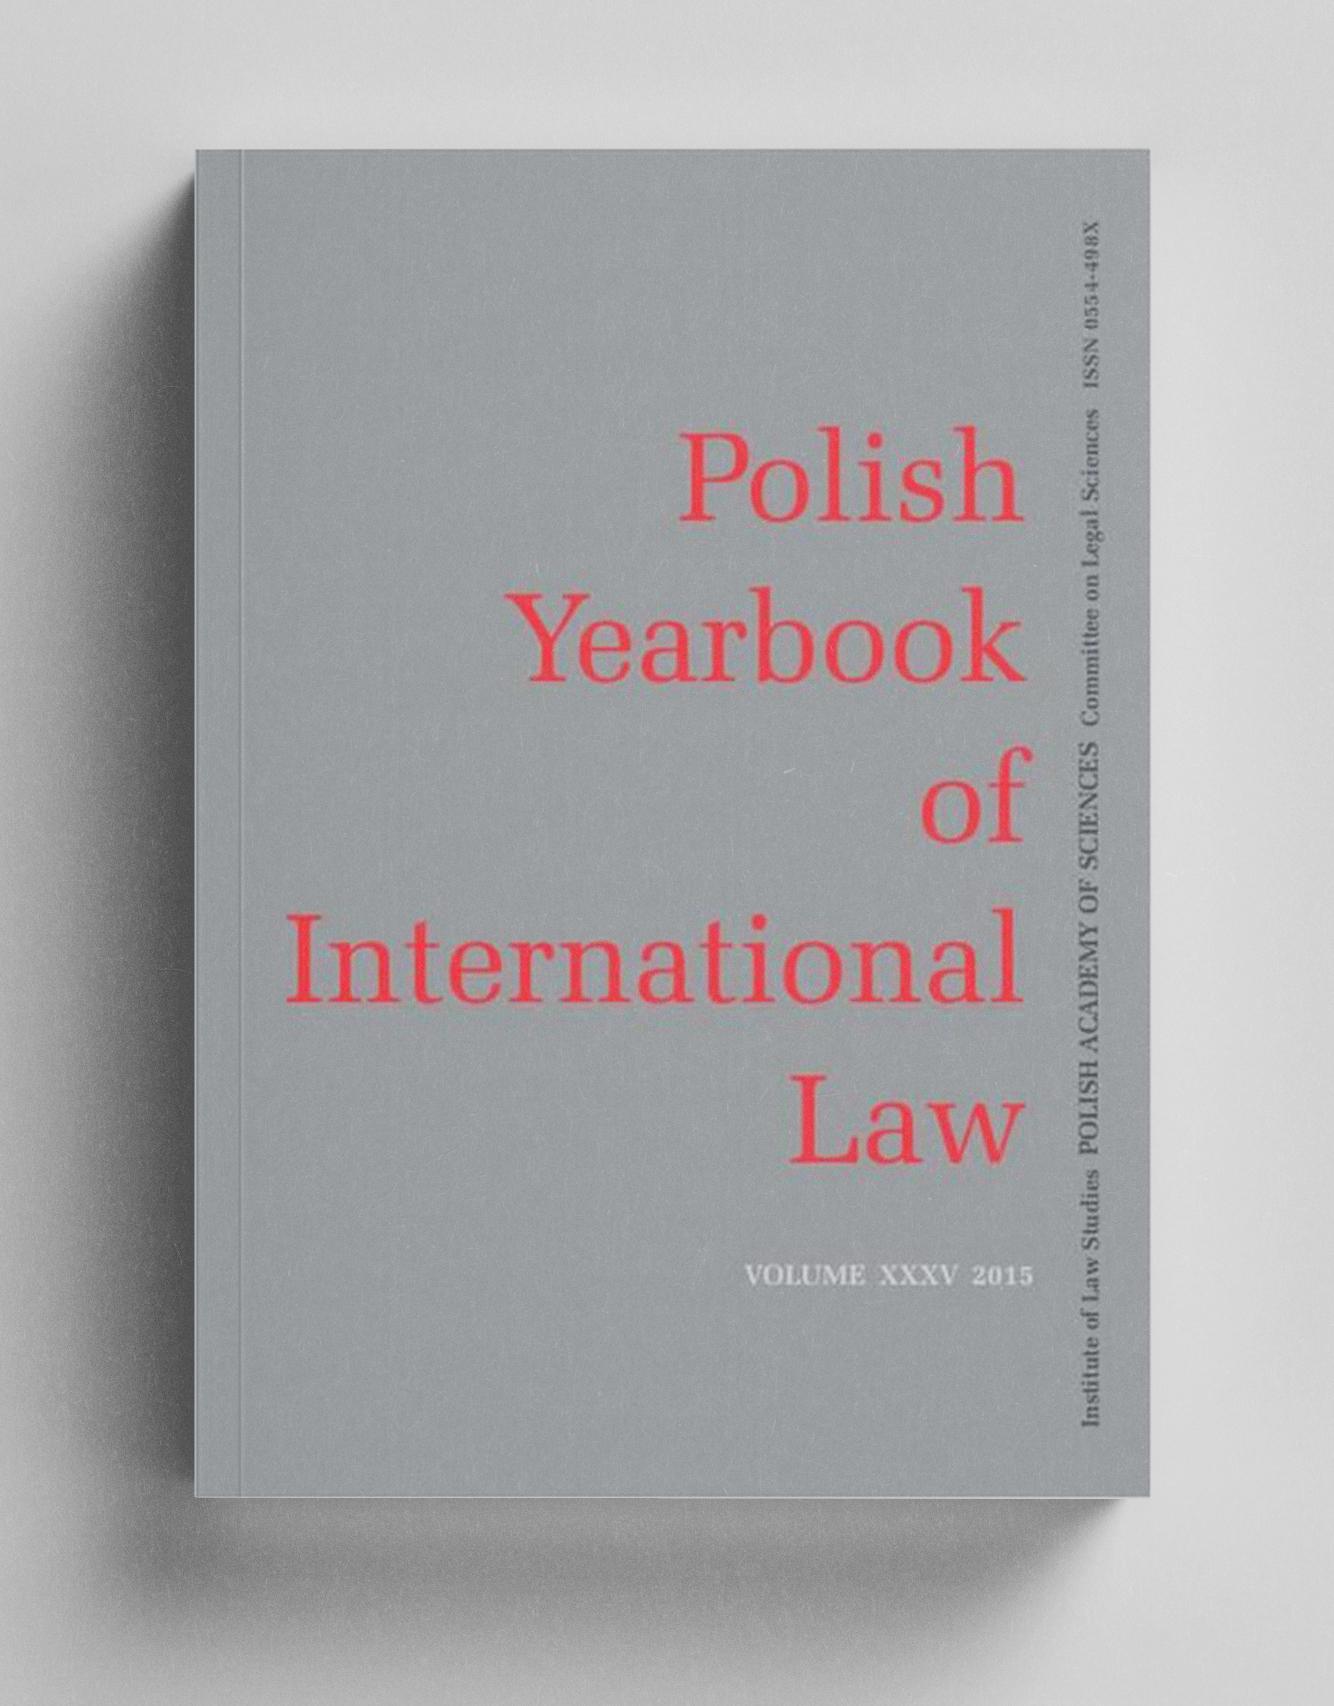 Okładka Polish Yearbook of International Law